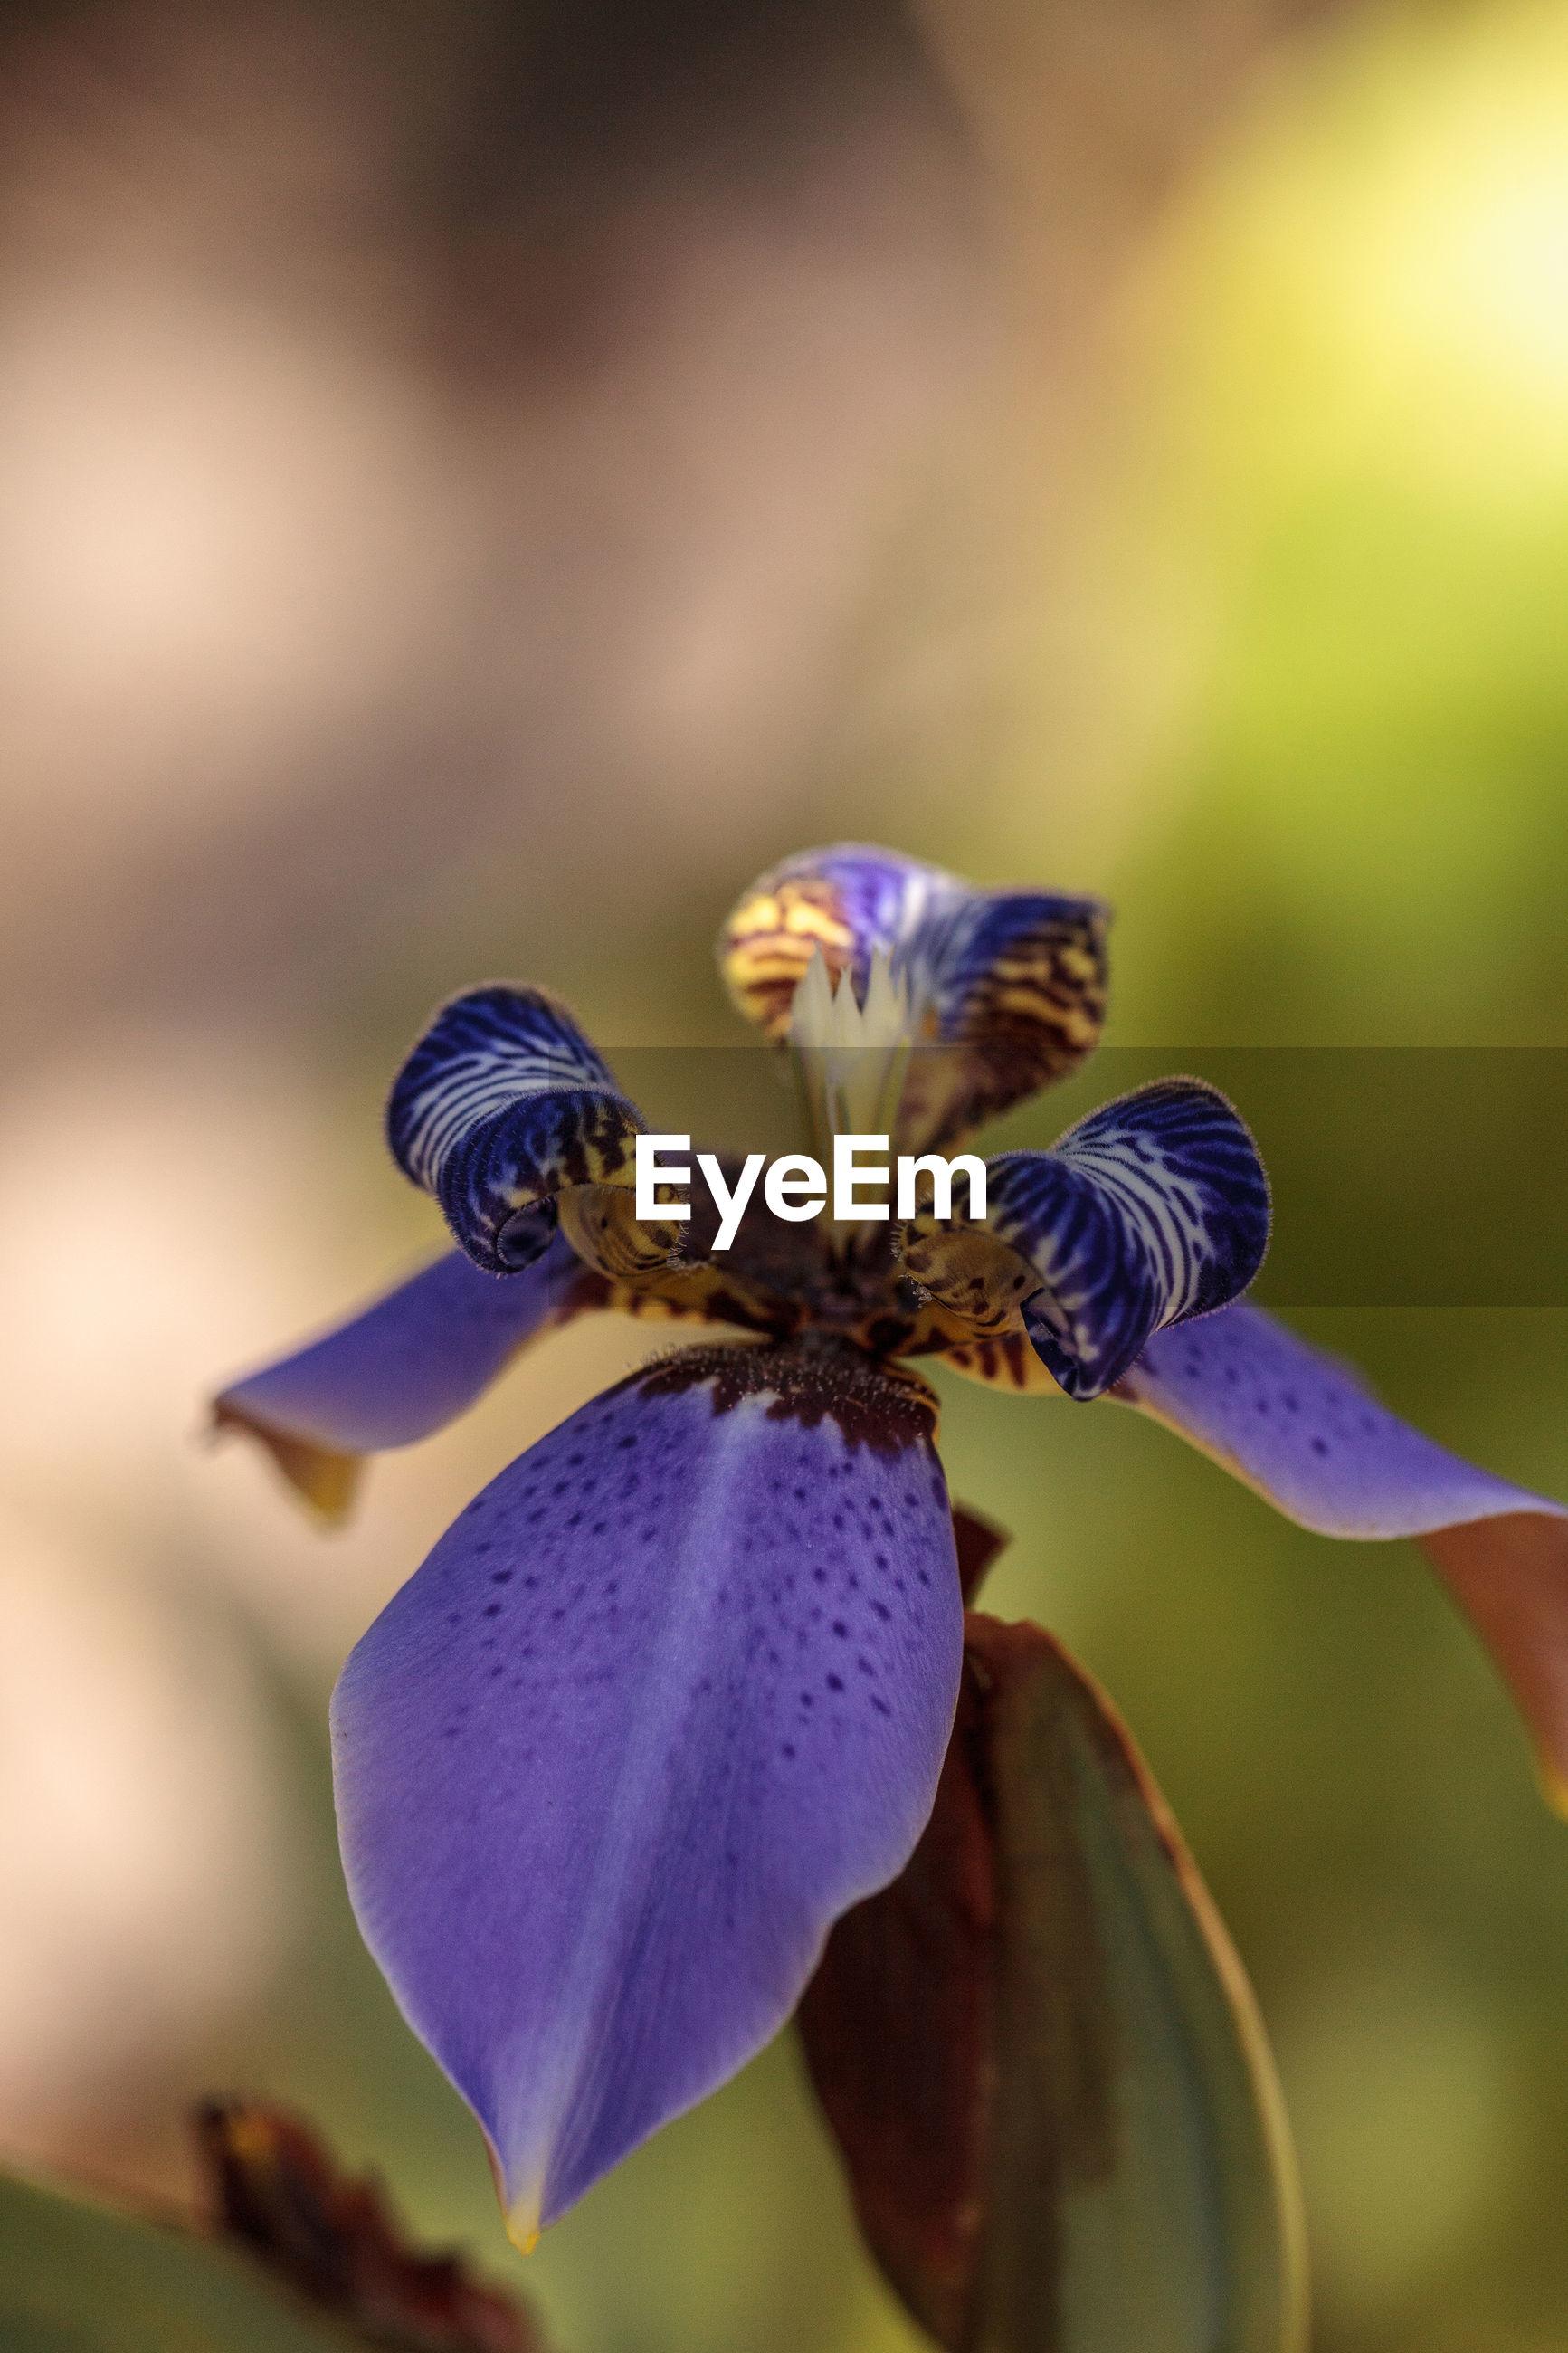 CLOSE-UP OF PURPLE IRIS FLOWERS ON PLANT